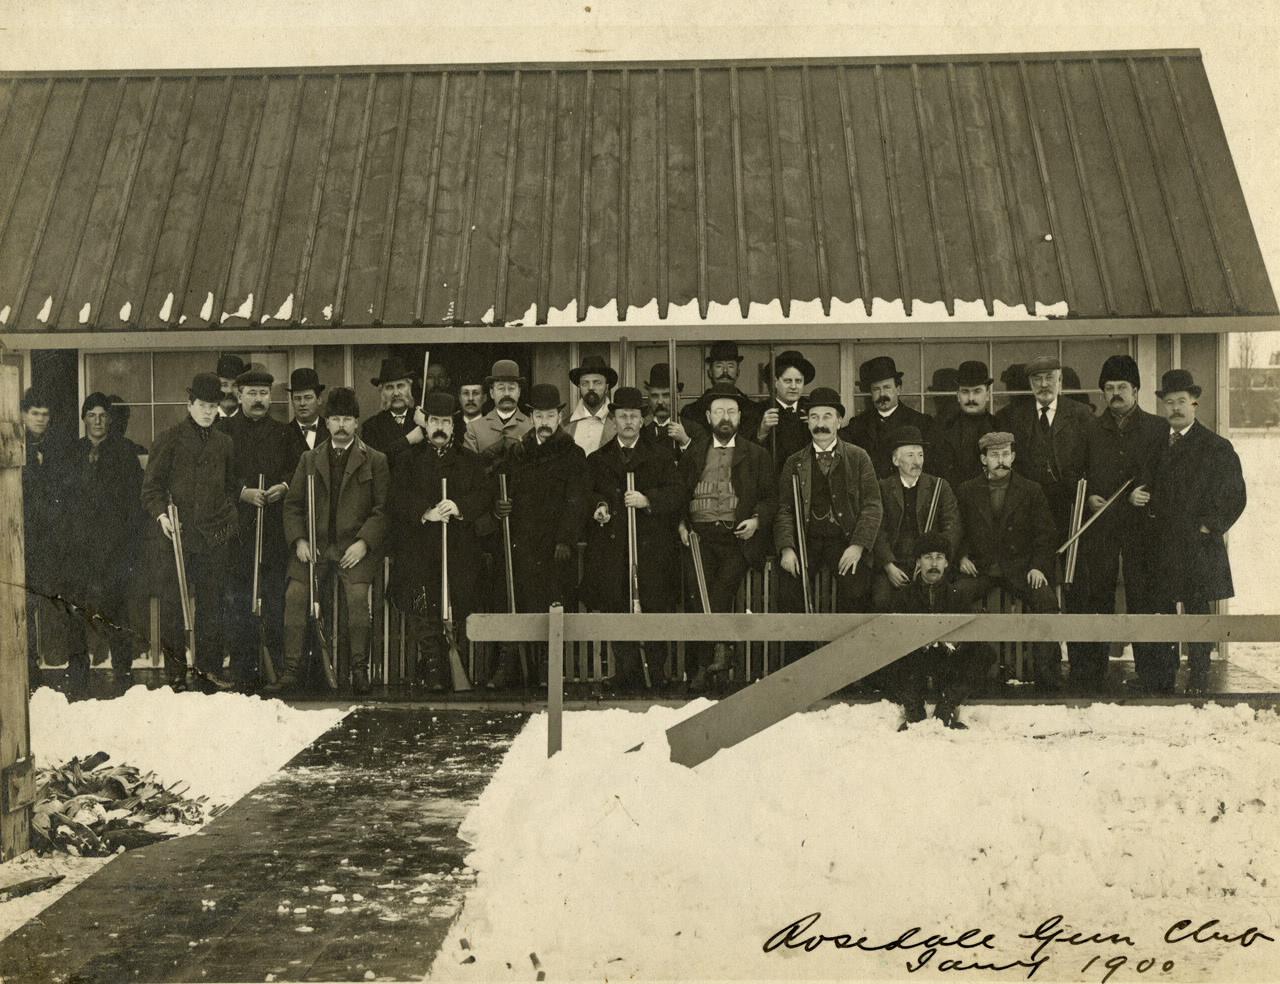 Rosedale Gun Club